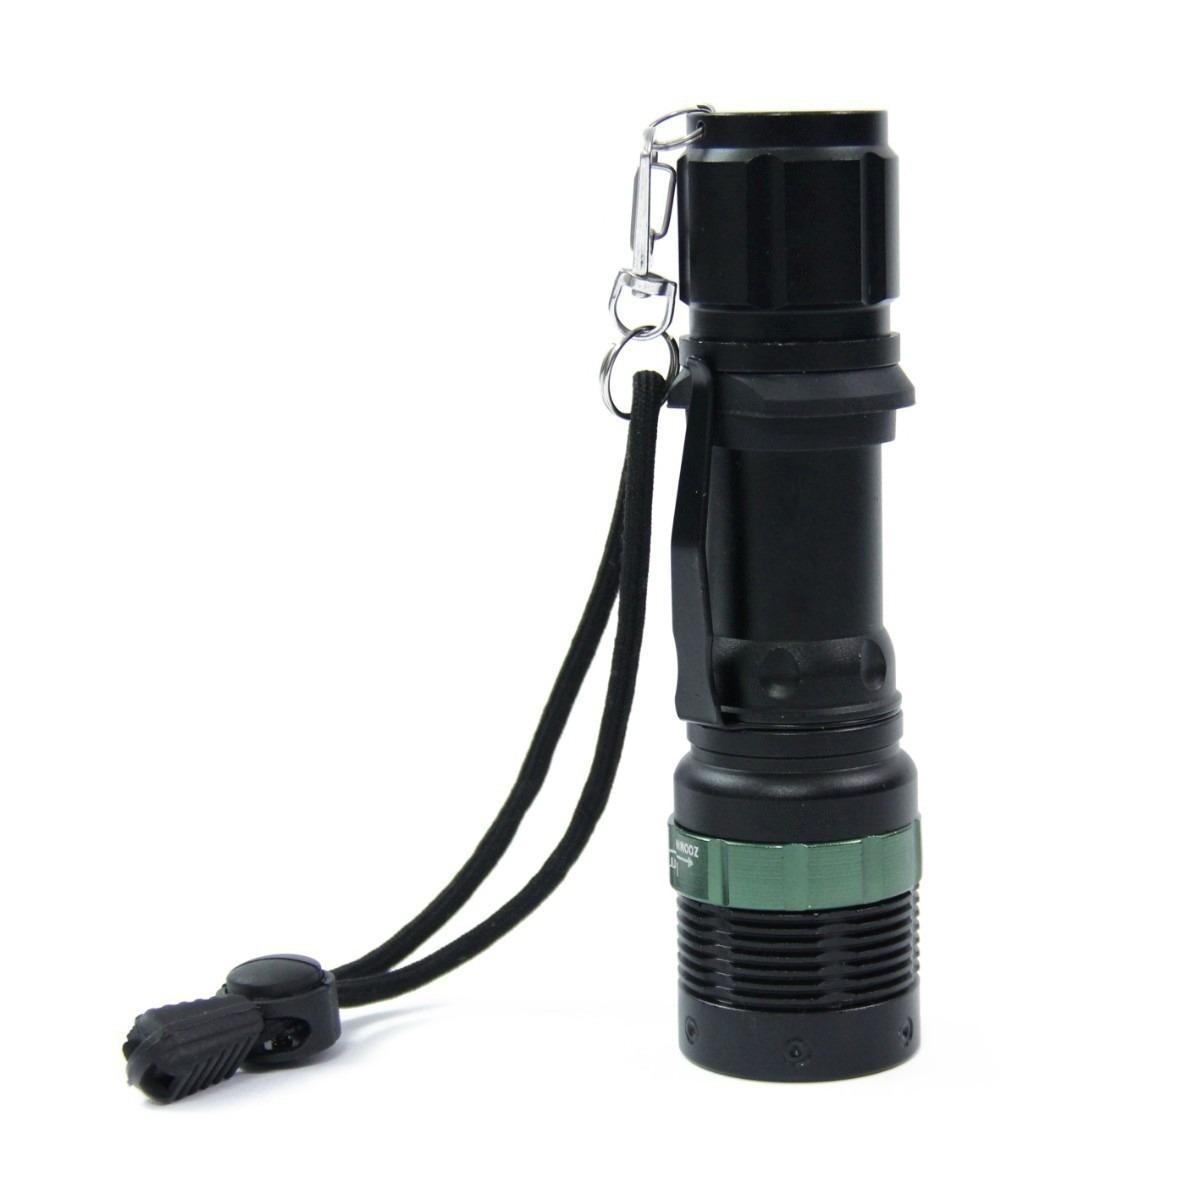 Kit Mini Lanterna Tática Profissional Recarregável 54000 Lms - ILIMITI SHOP